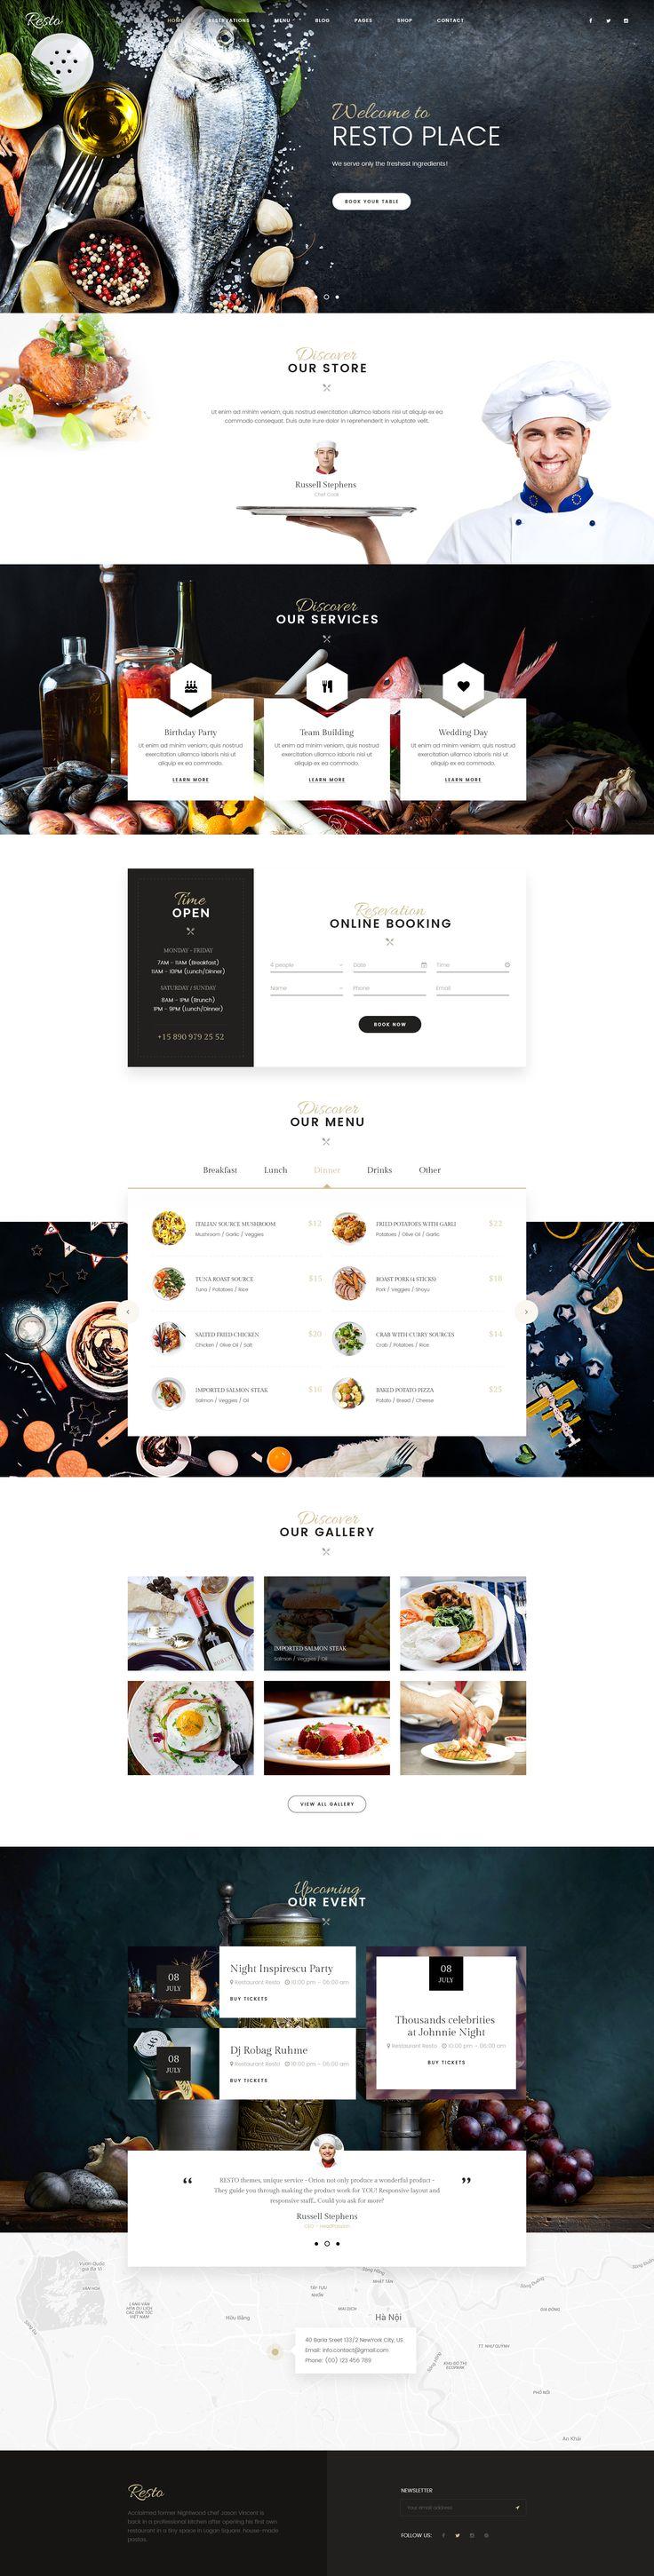 101 best design images on pinterest website layout advertising